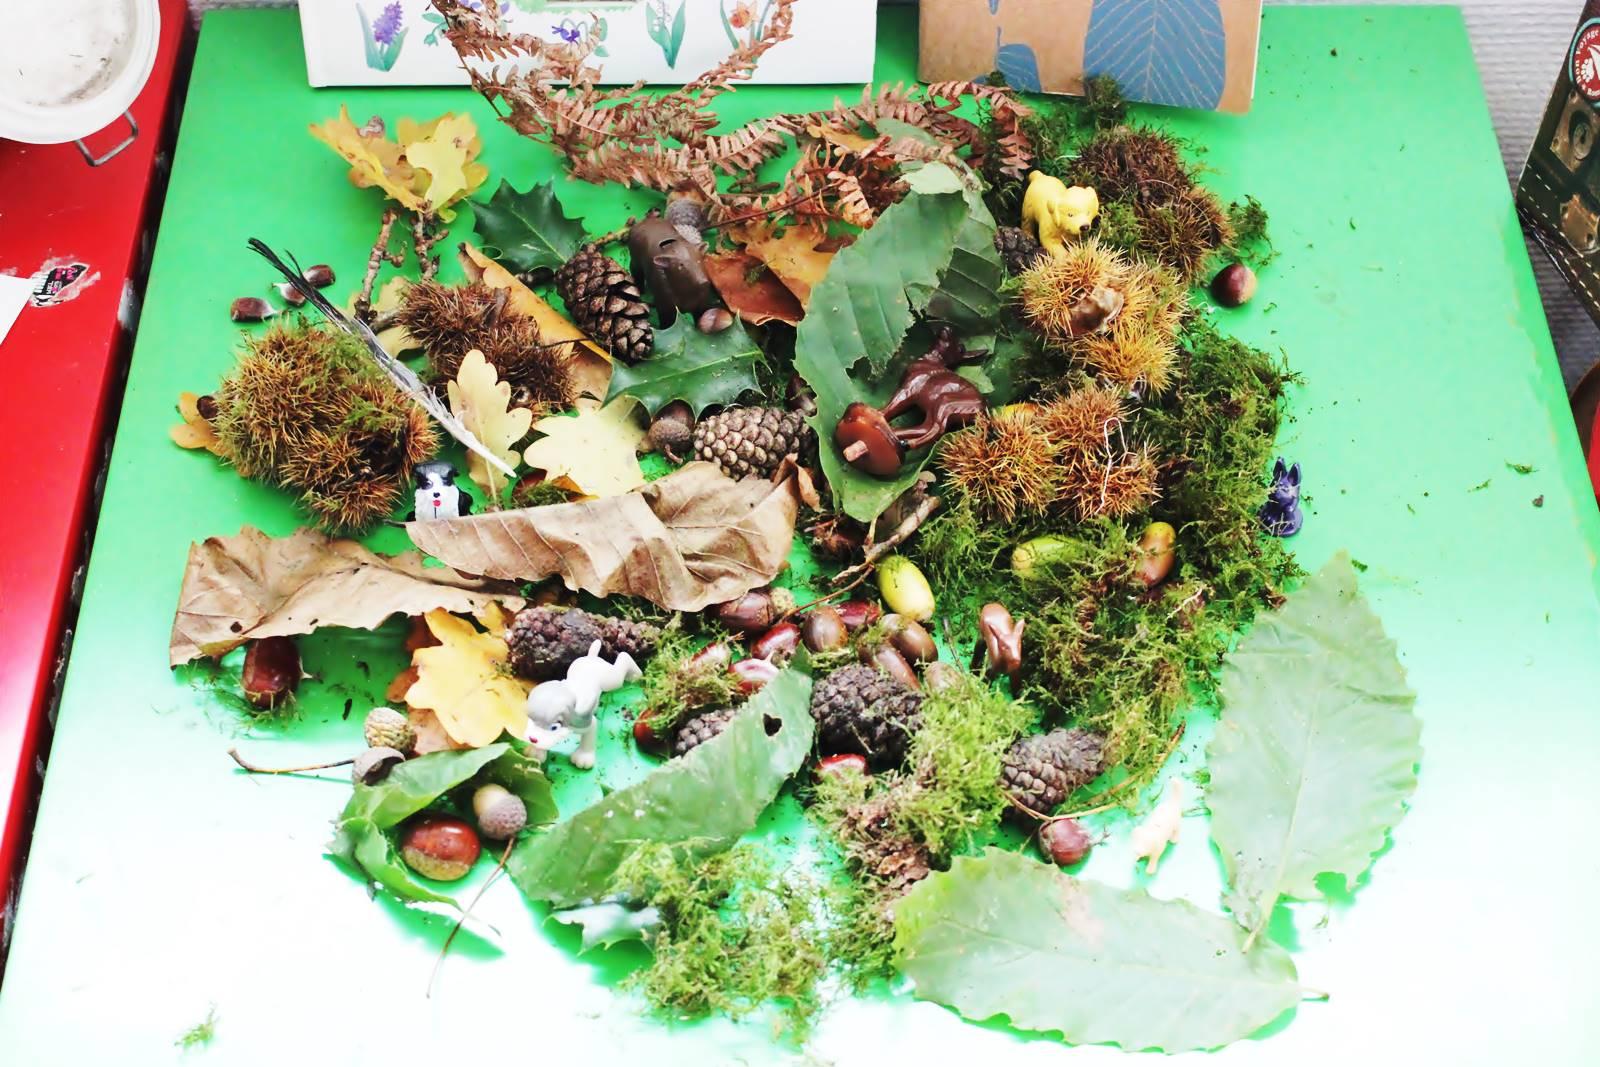 Table des saisons steiner waldorf ief homescooling ecole maison automne 5